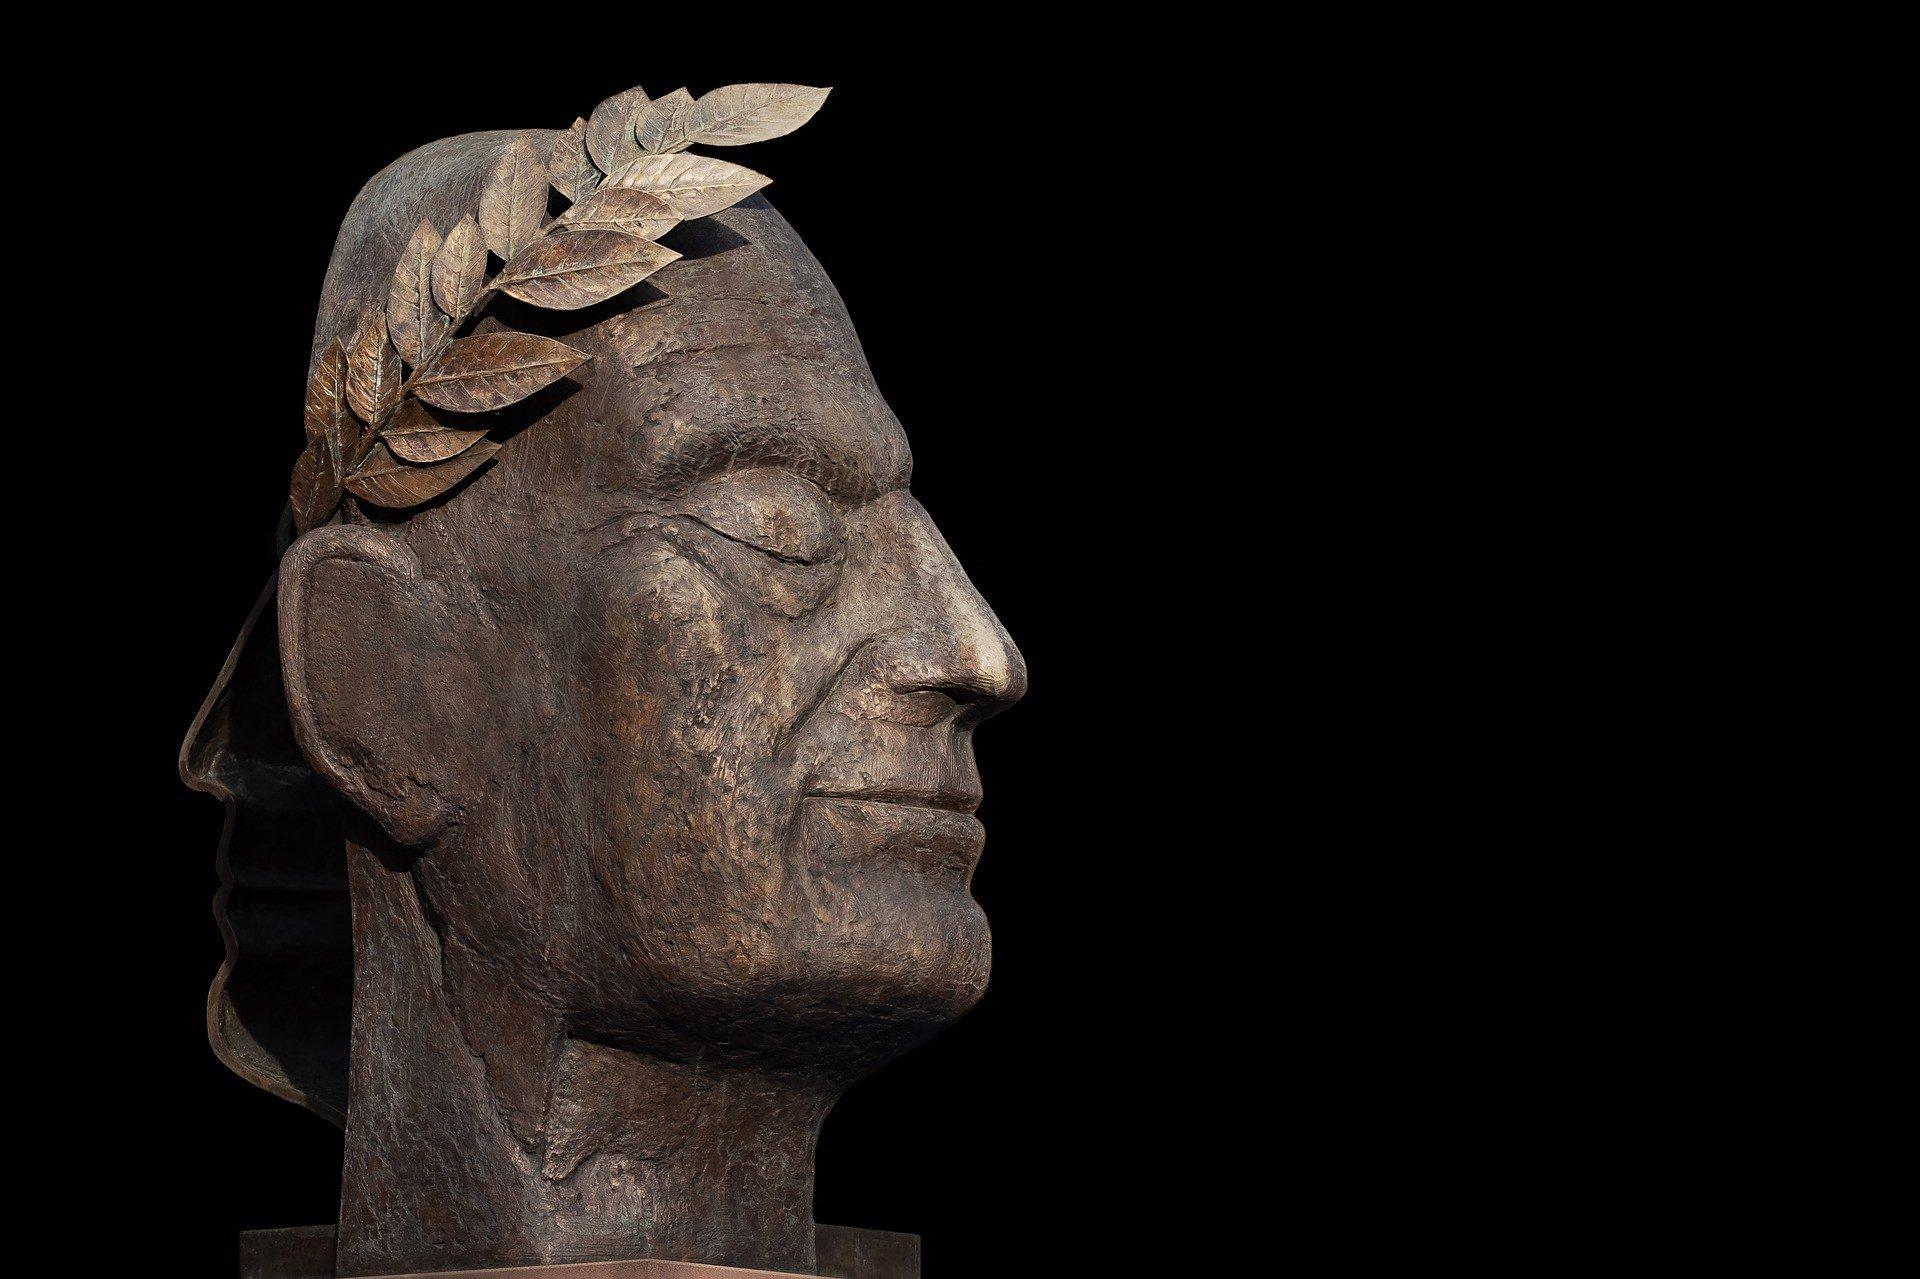 sculpture-3357150_1920